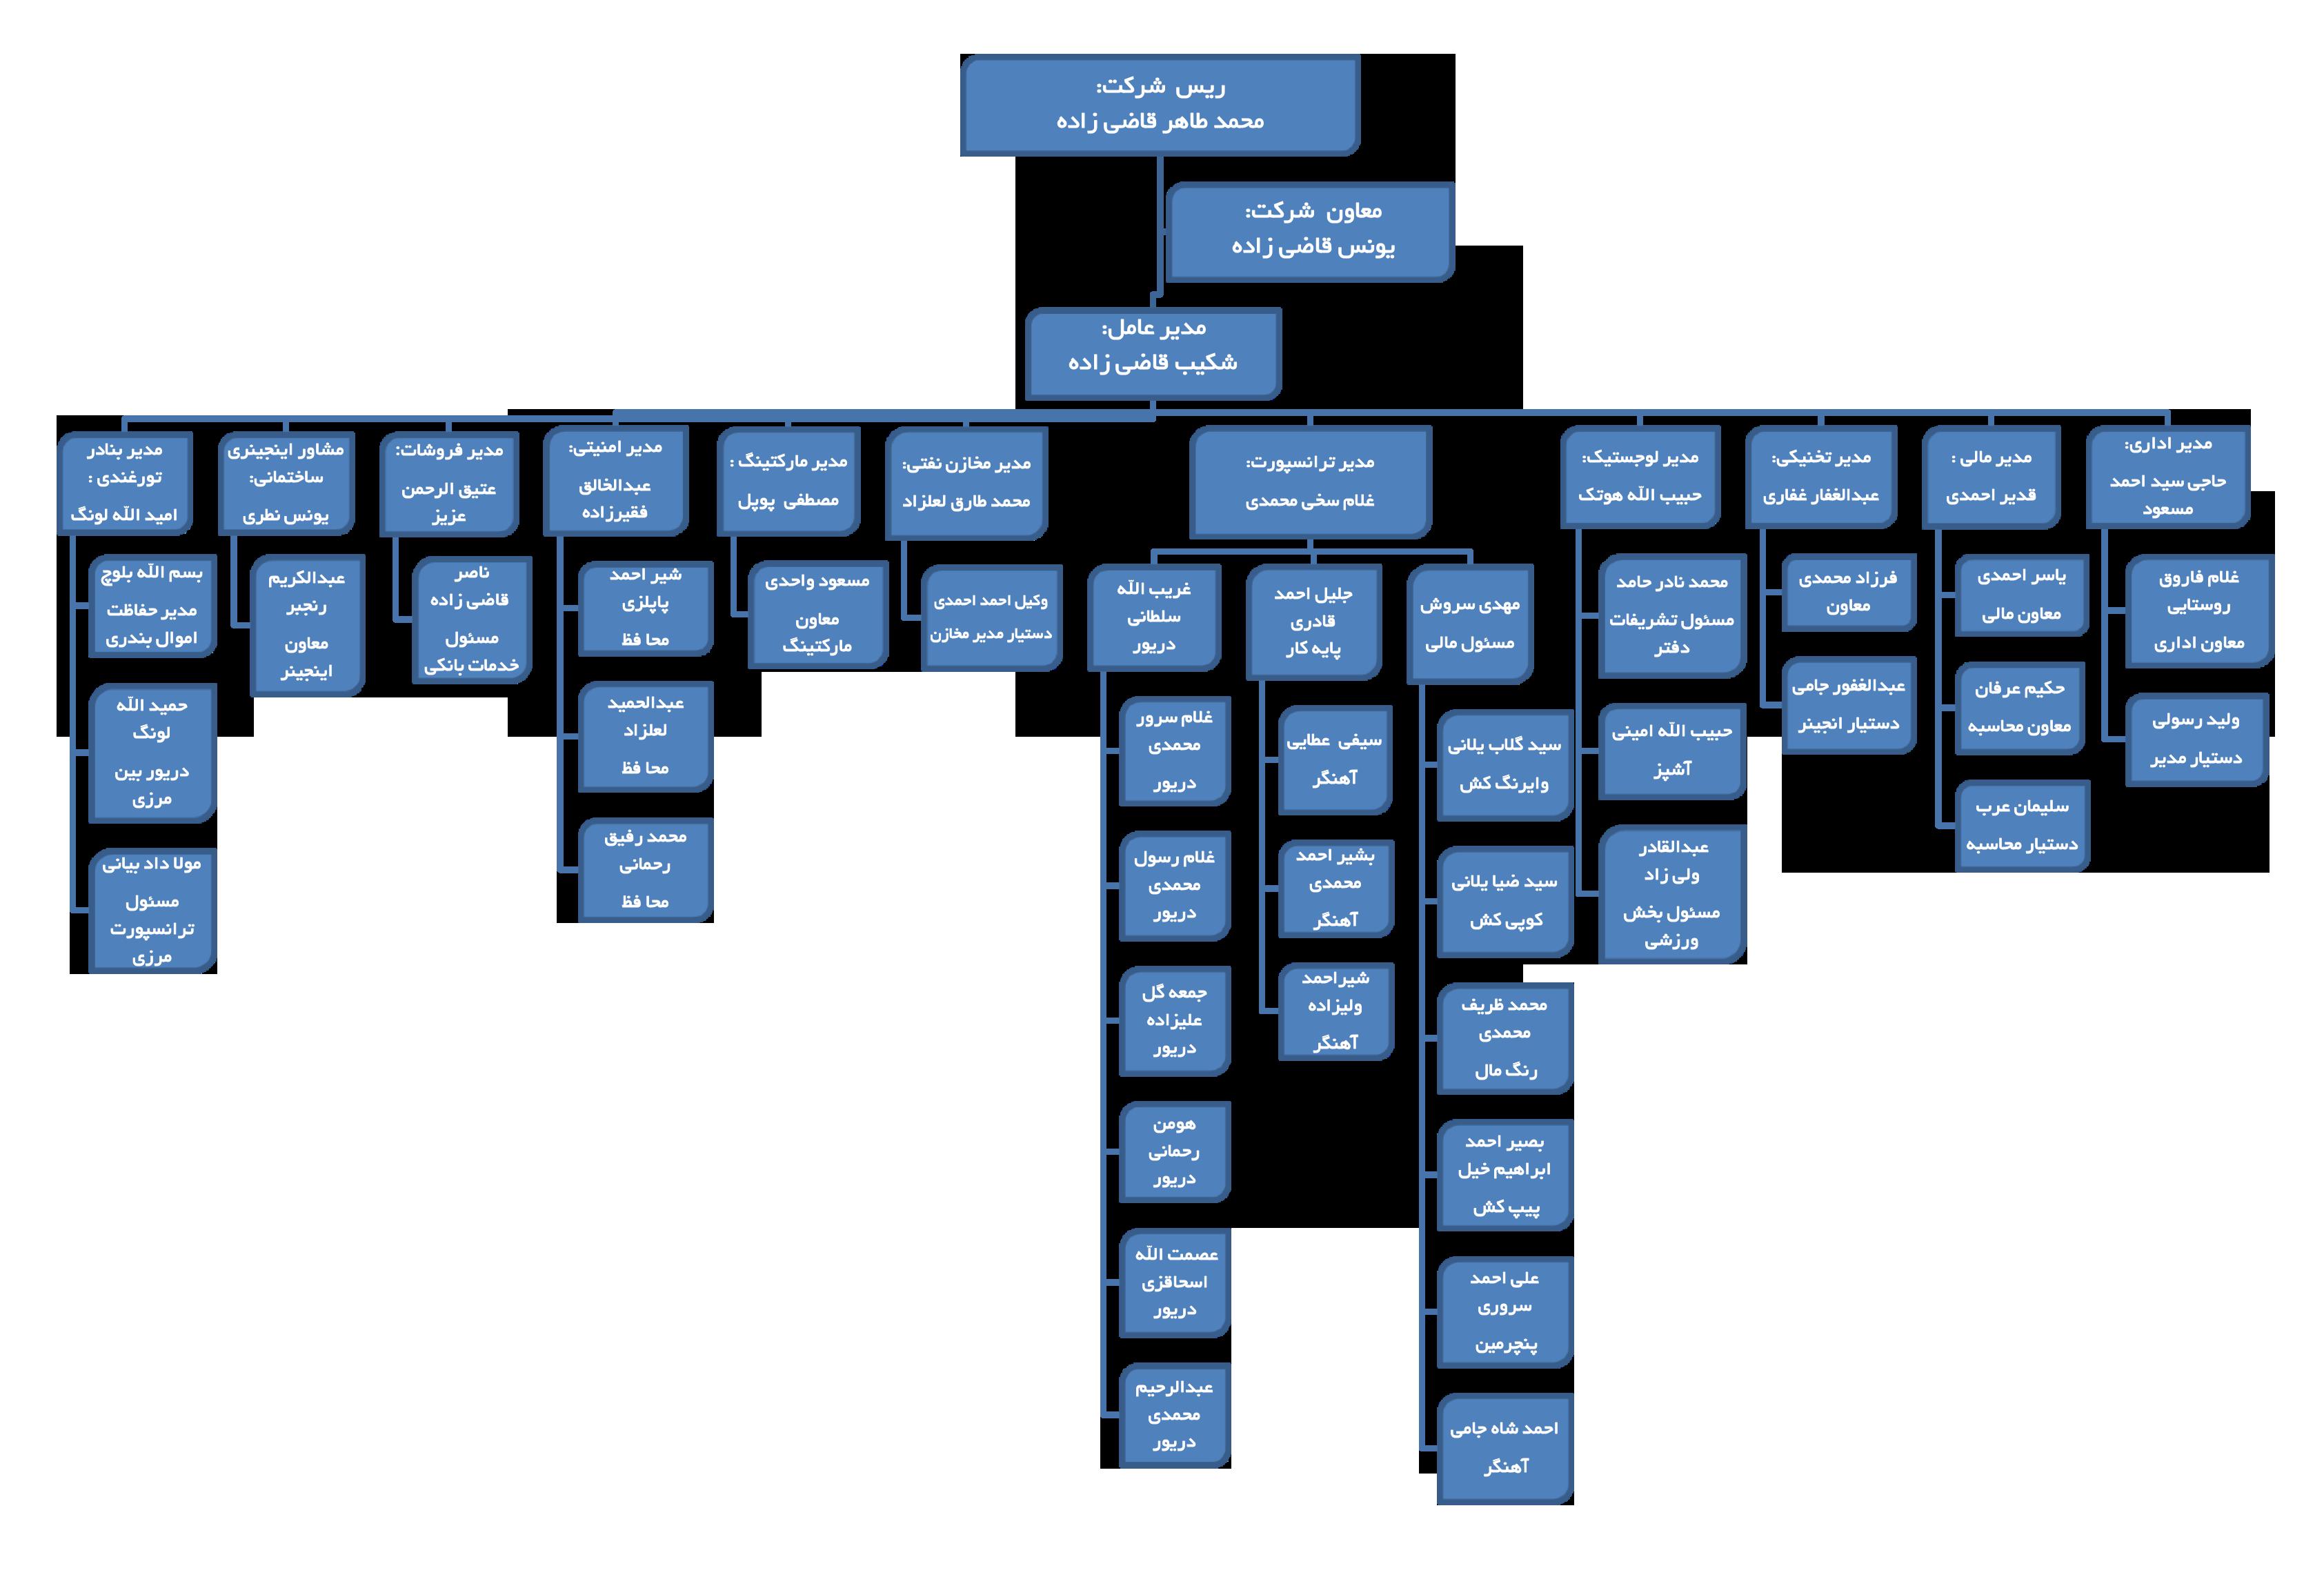 https://www.younesshakib.com/fa/wp-content/uploads/2018/05/chart.png